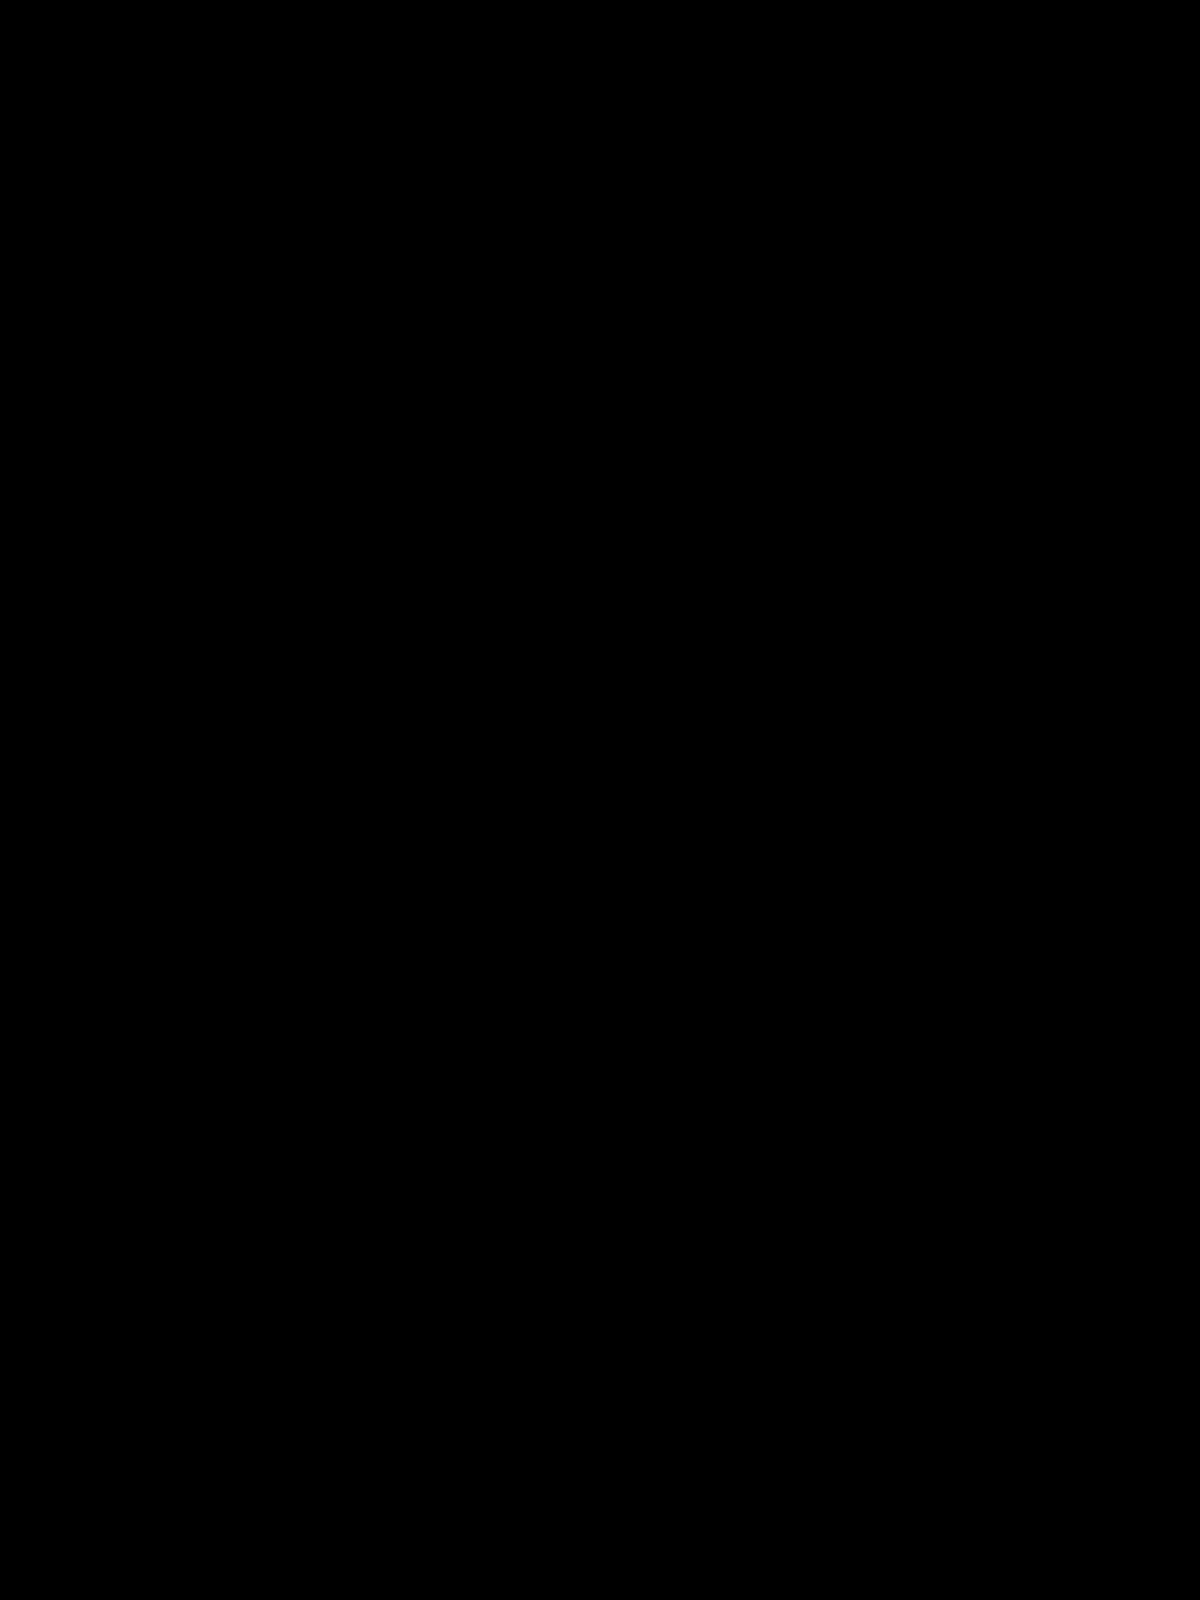 edel-7